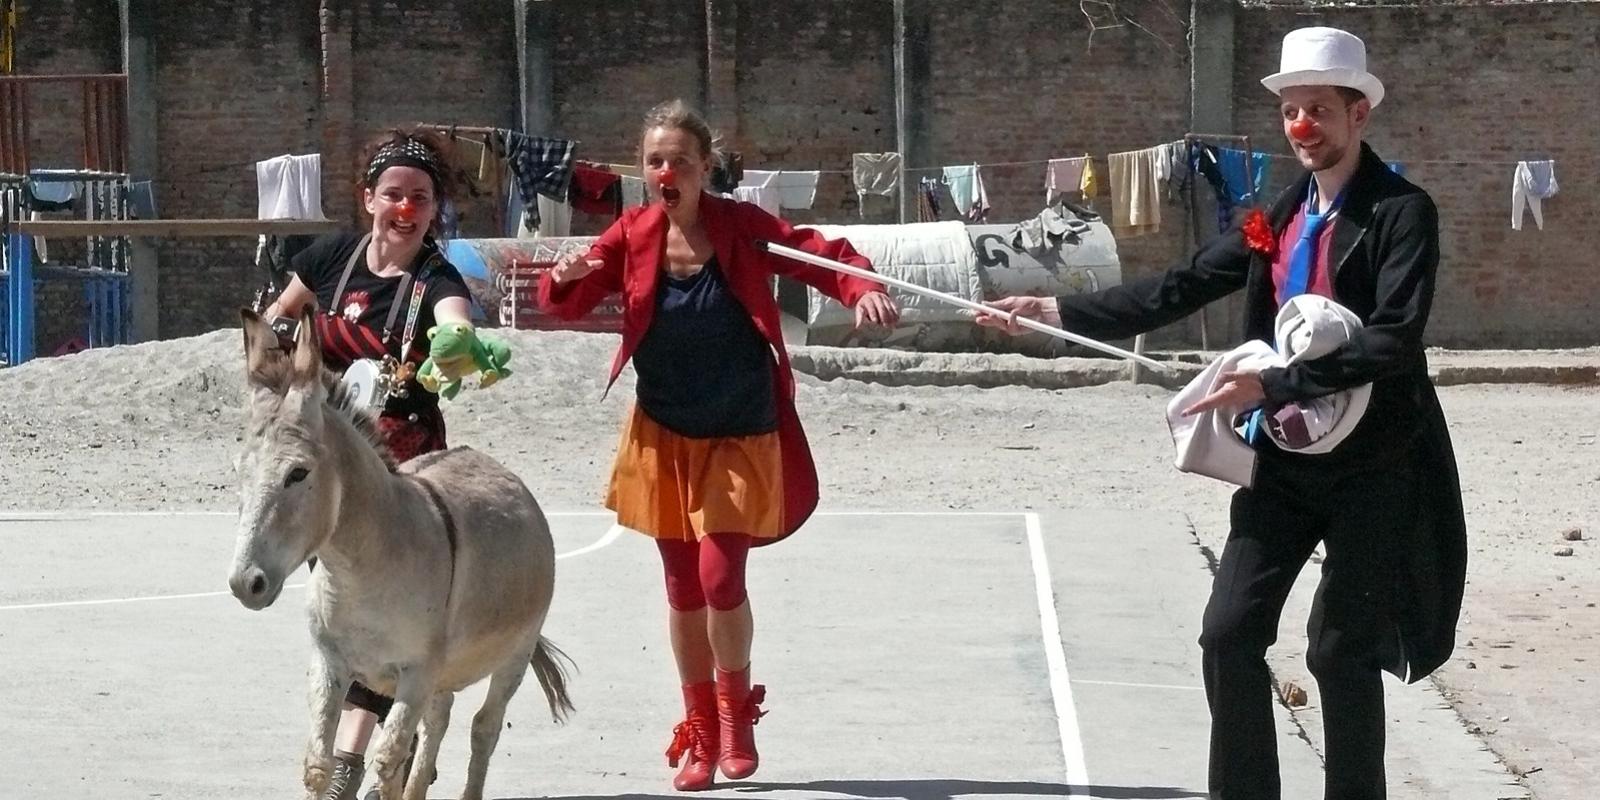 http://clownsohnegrenzen.org/wp-content/uploads/2018/05/2014-Nepal-Ralf-Hanrieder_1600x800_acf_cropped.jpg